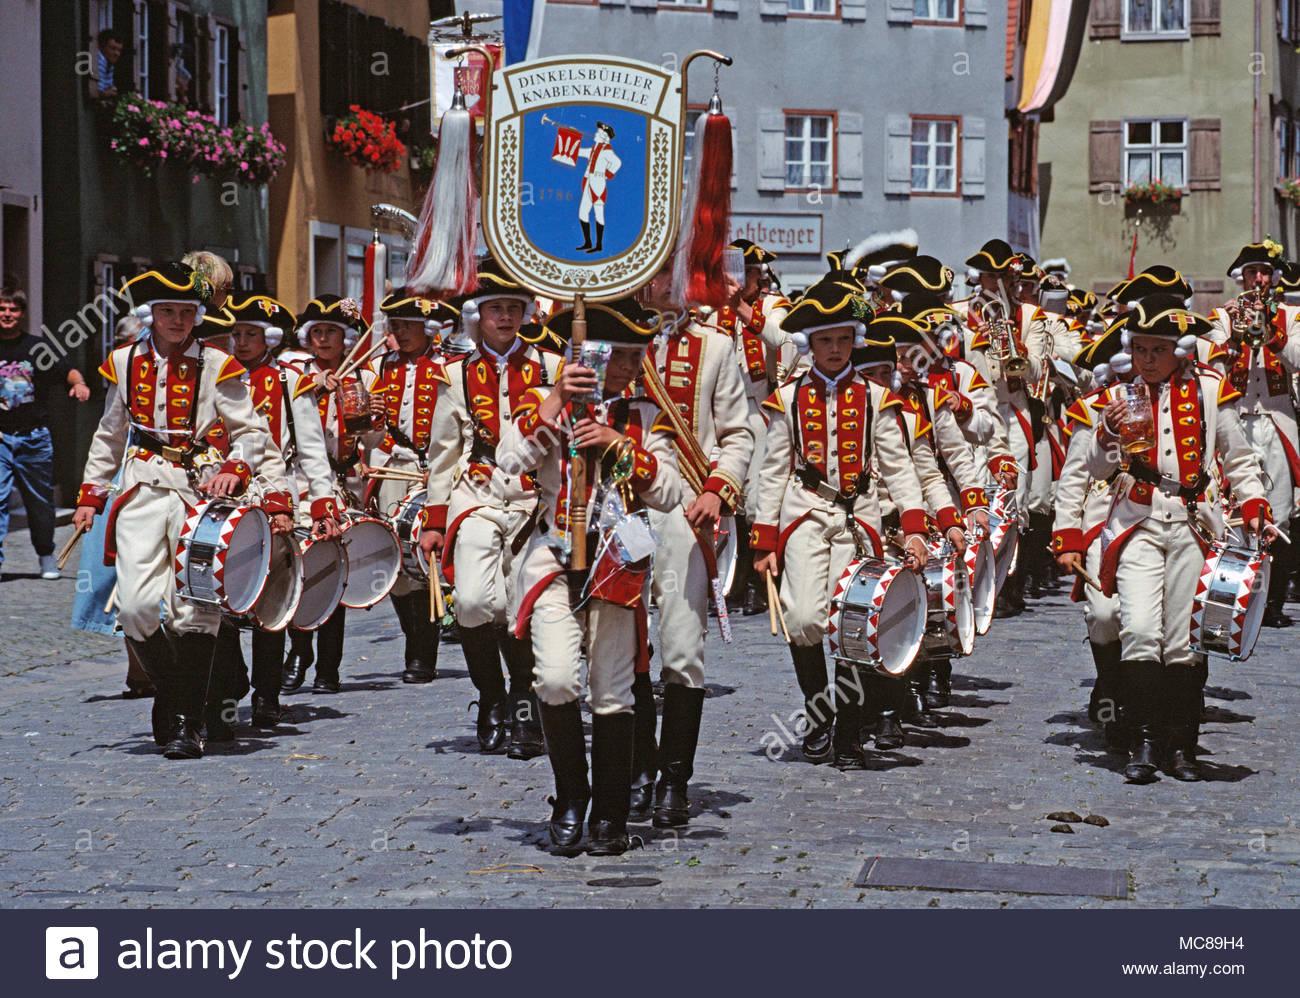 Germania. Dinkelsbühl. Kinderzeche Dinkelsbühl - storica festa. Ragazzi adolescenti marching band in costume. Immagini Stock